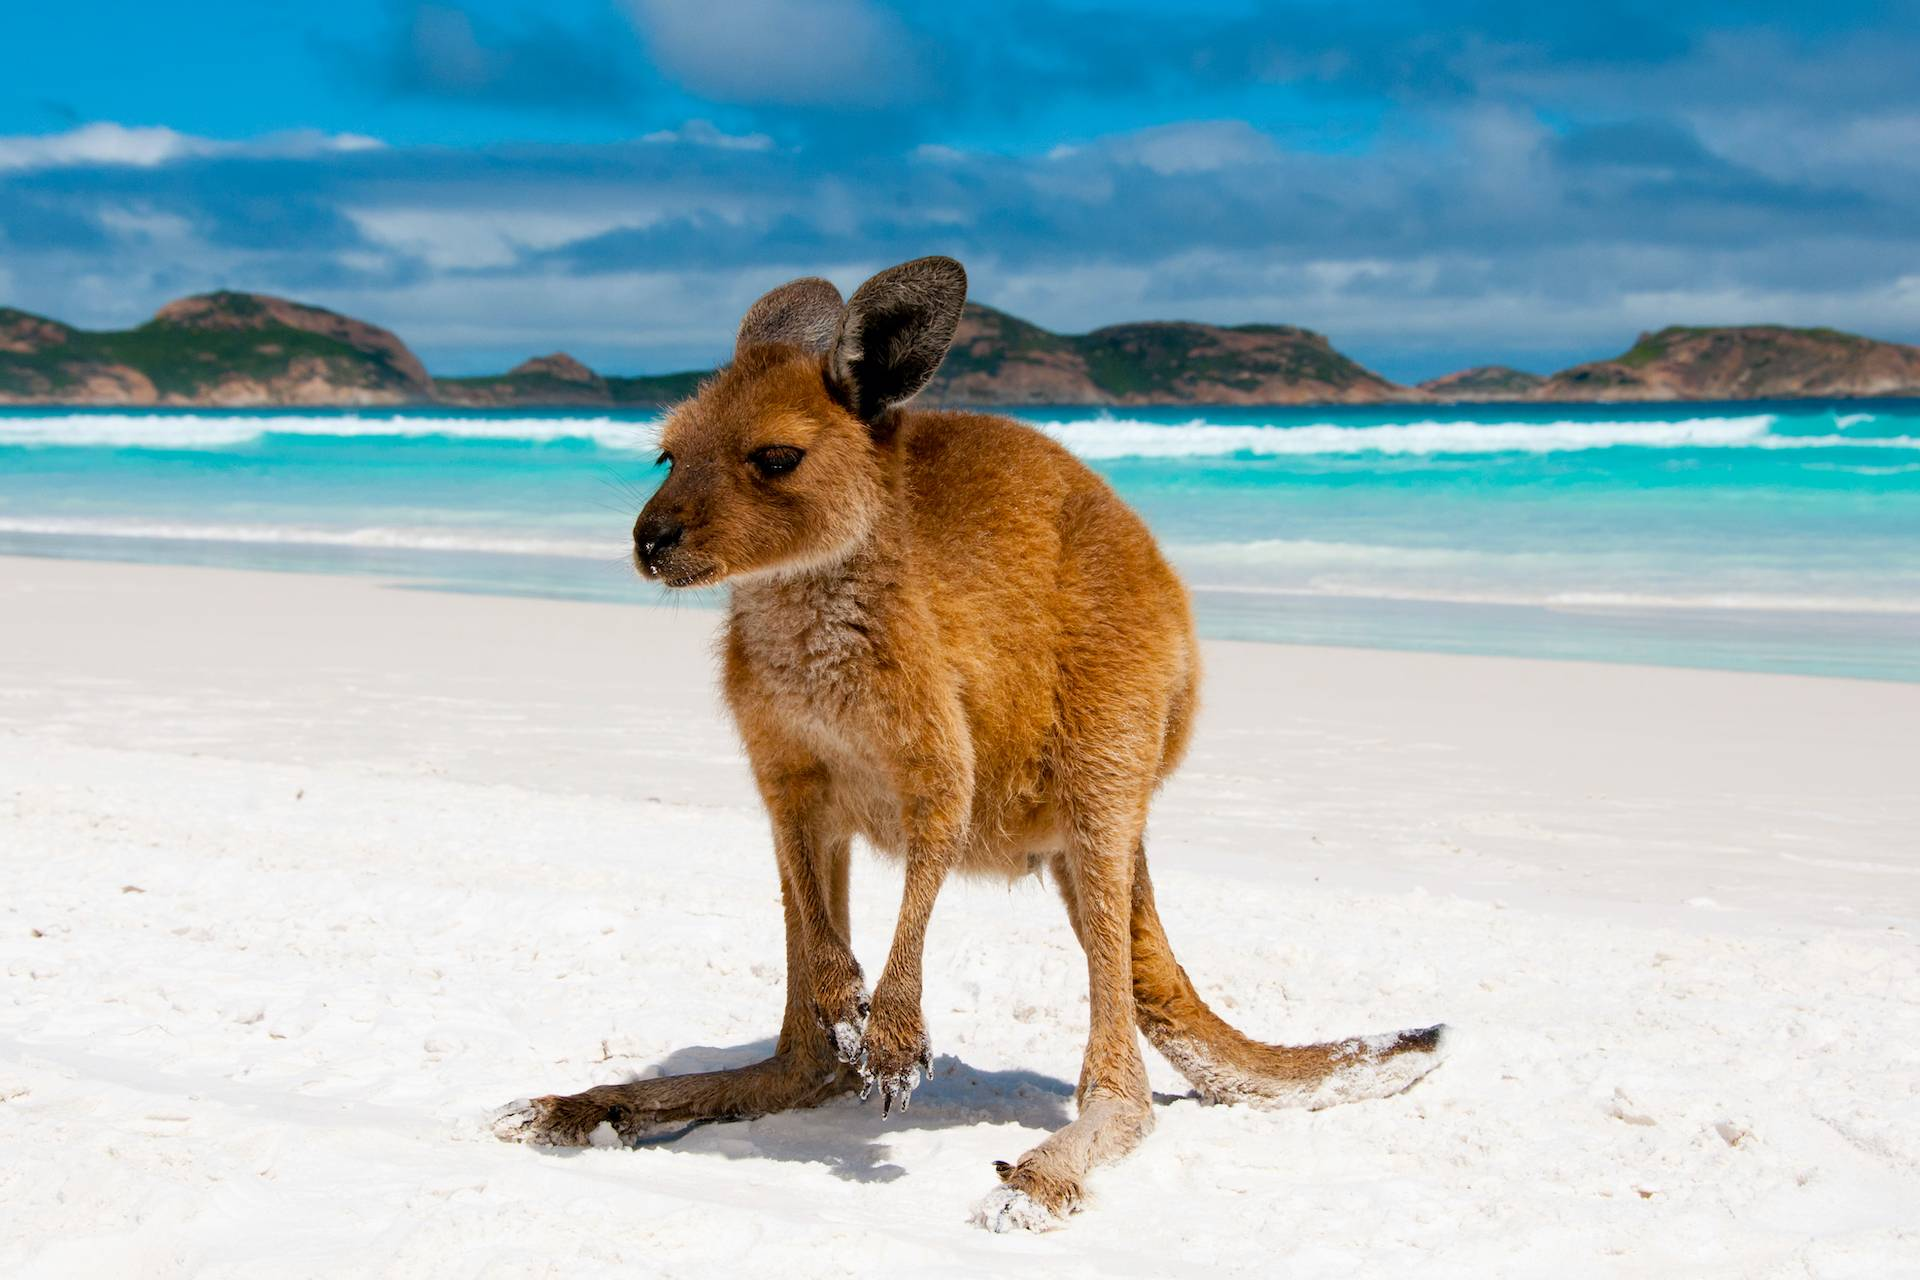 Где живут кенгуру, описание животного и образ жизни